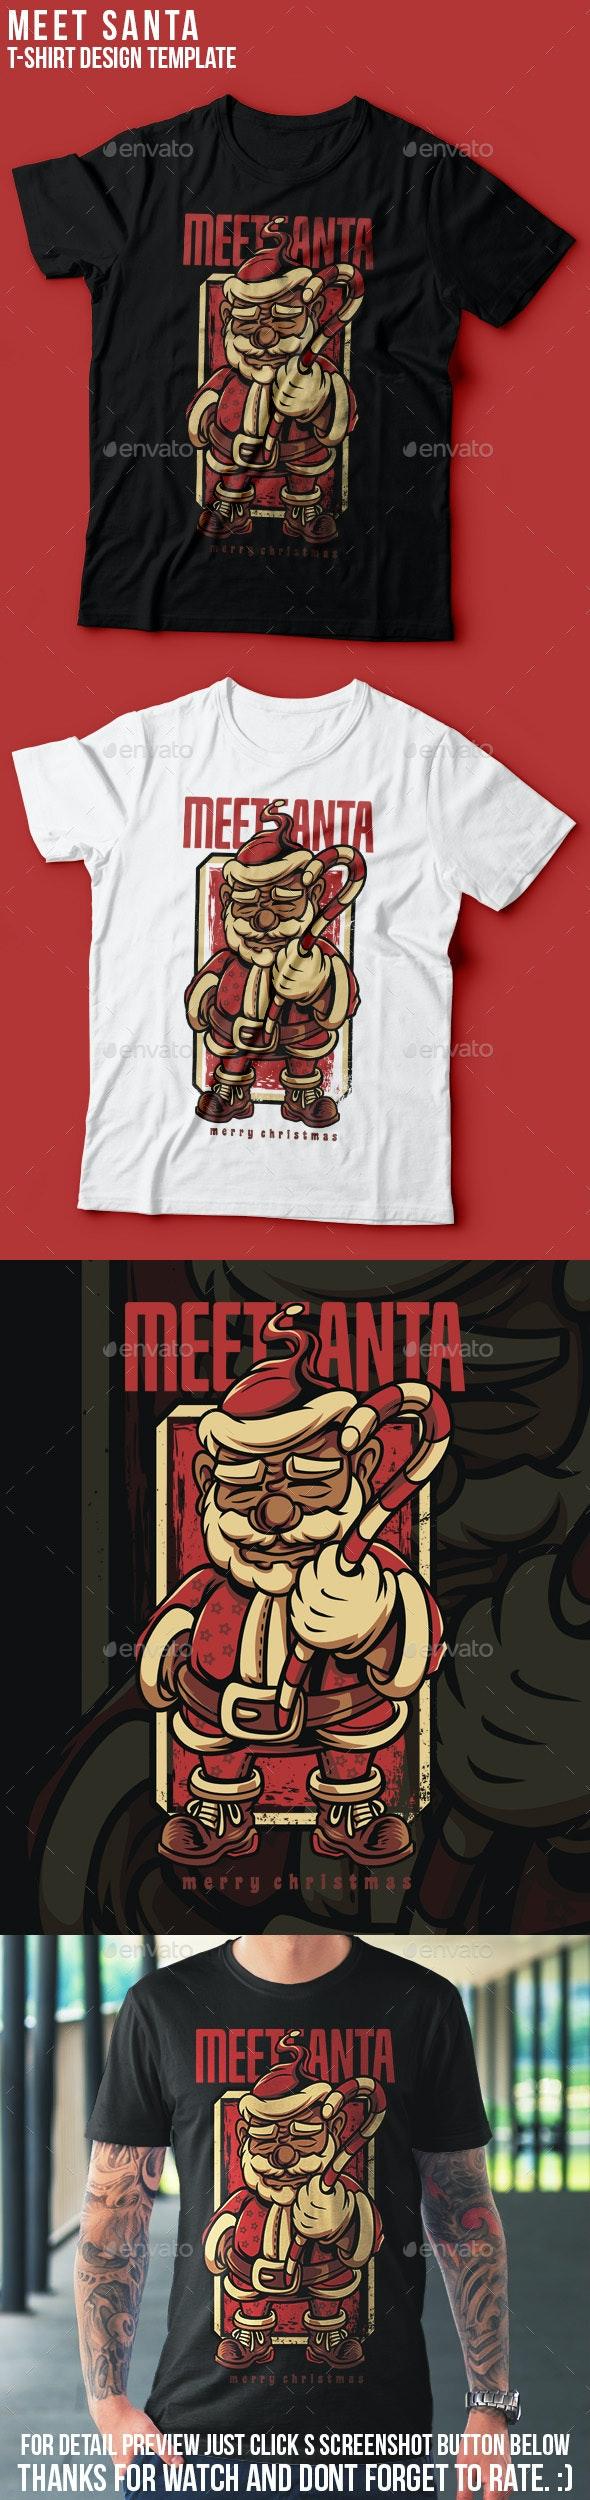 Meet Santa Happy Christmas T-Shirt Design - Events T-Shirts